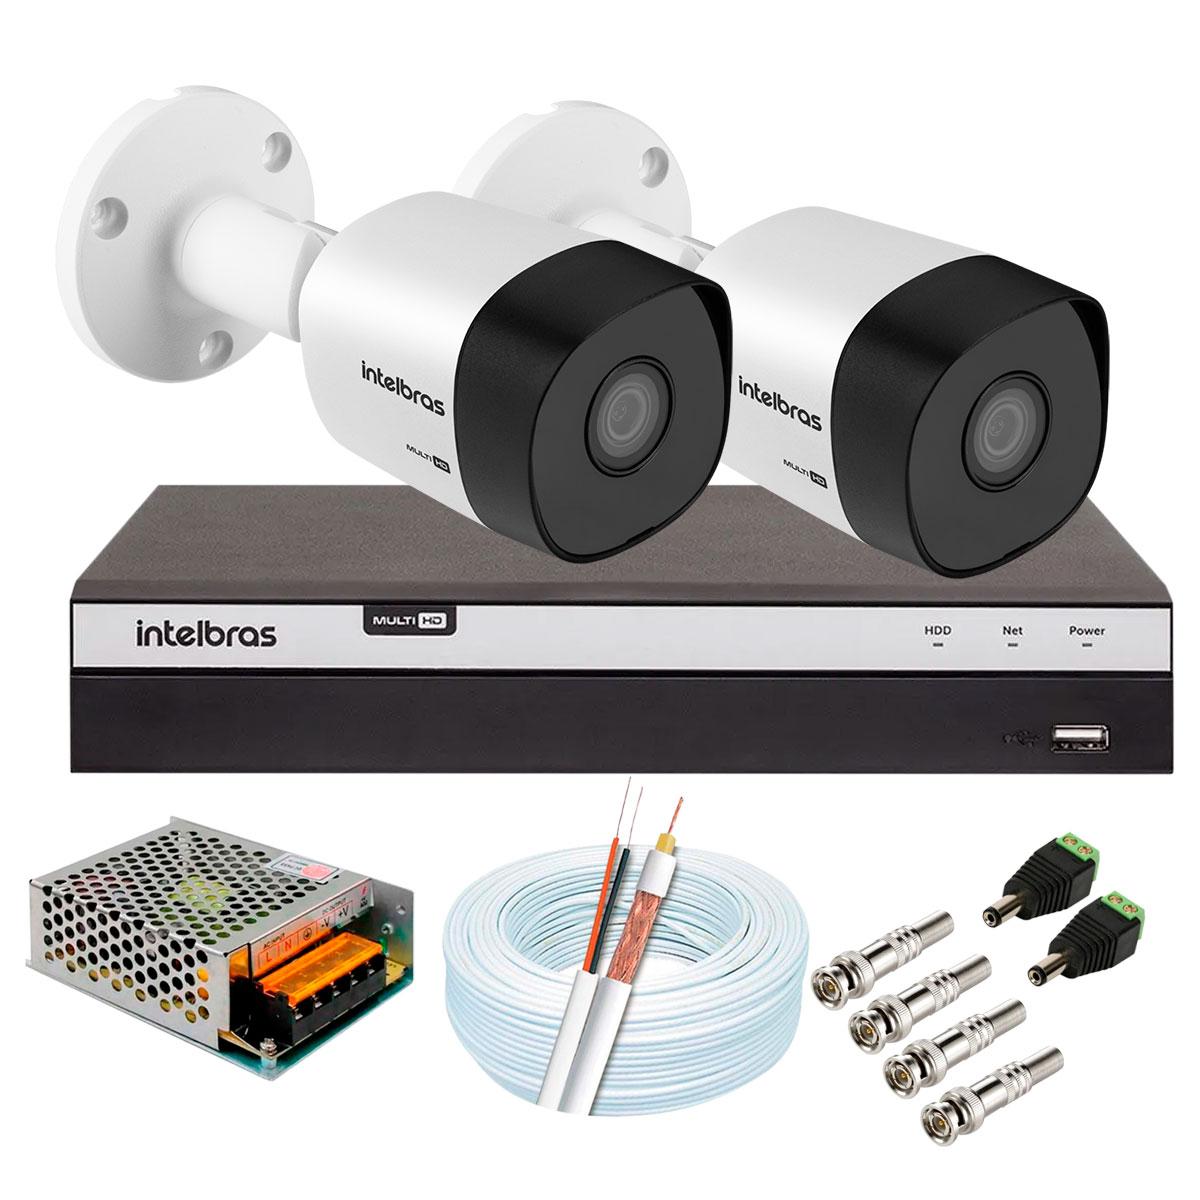 kit-2-cameras-de-seguranca-full-hd-1080p-vhd-3230-b-g5-dvr-intelbras-mhdx-3108-full-hd-de-08-canais-acessorios